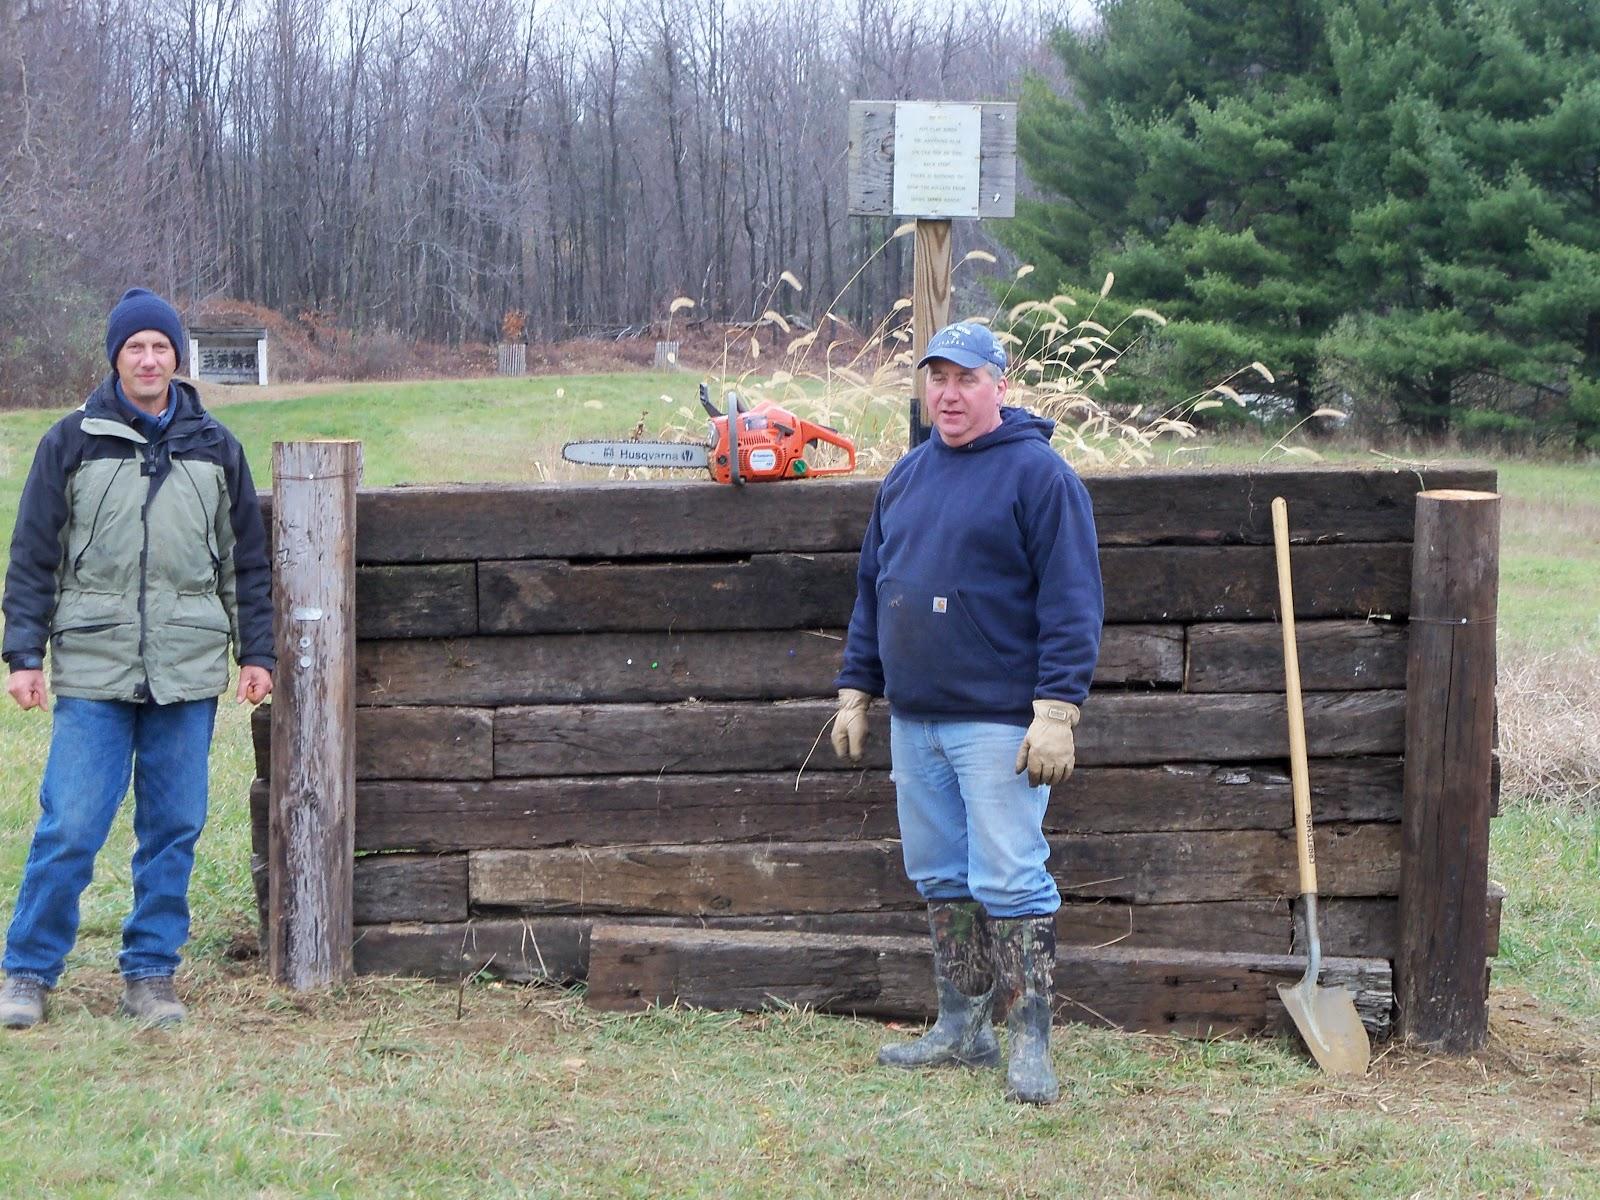 Backyard Archery Range Backstop :  Work party completes 50yard backstop & archery range; camp winterized